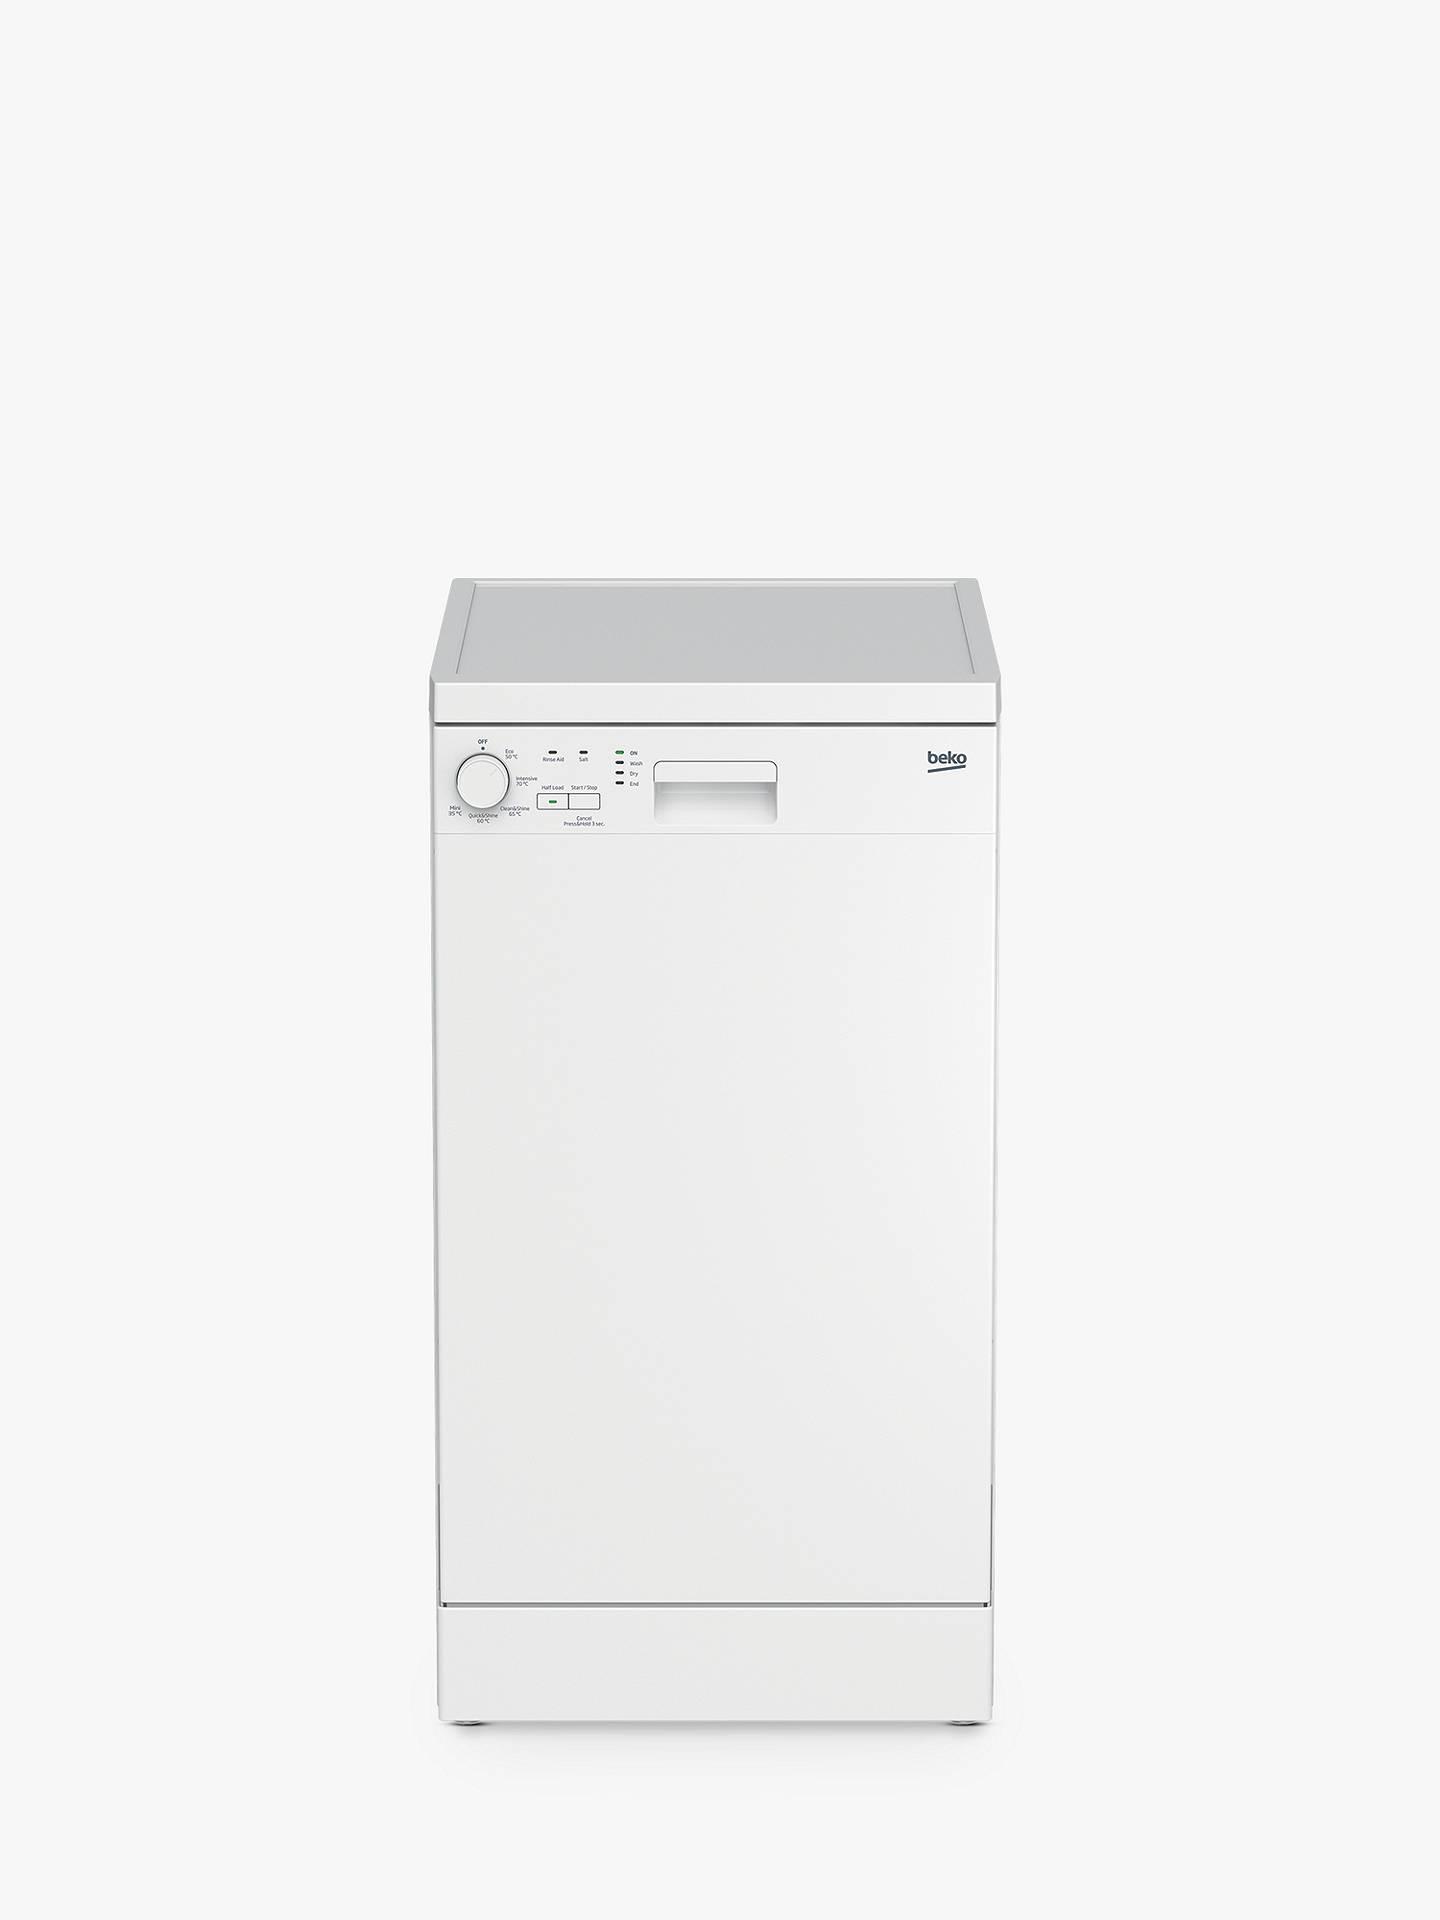 Beko Dfs05 J1 W Freestanding Slimline Dishwasher, White by Beko